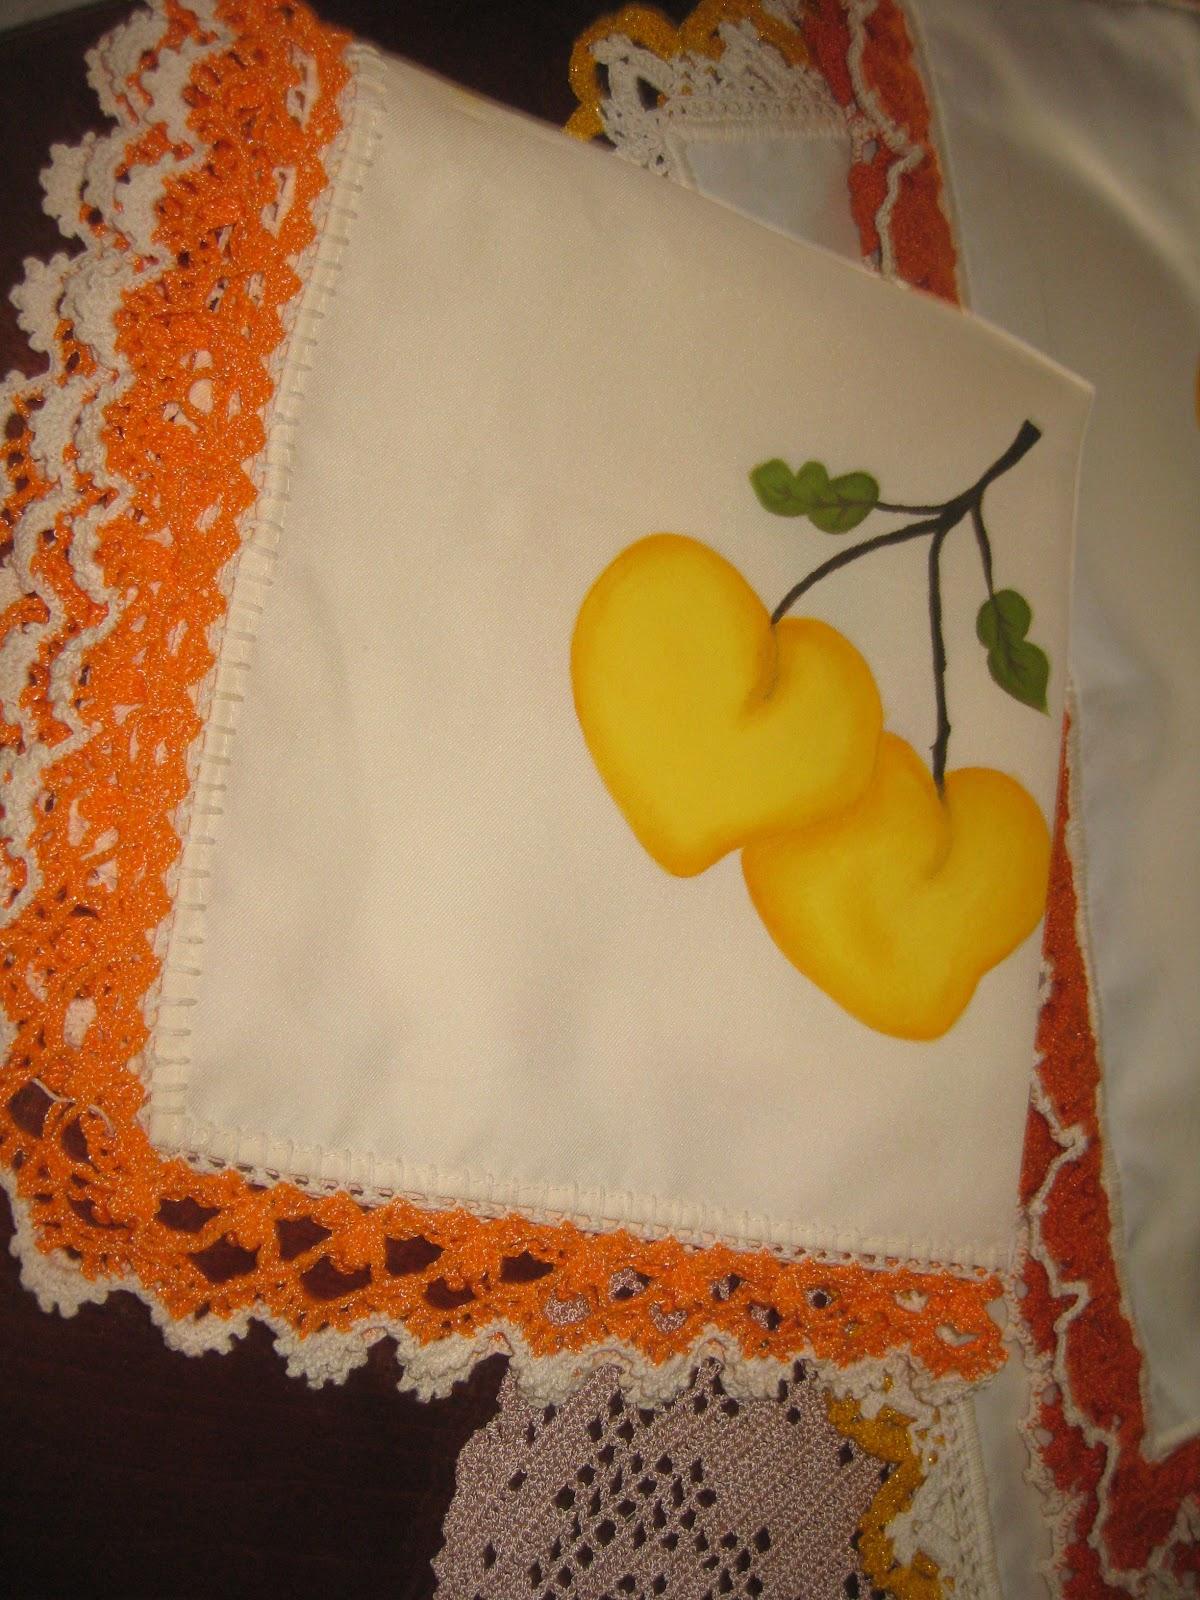 orillas en crochet para servilletas apexwallpapers